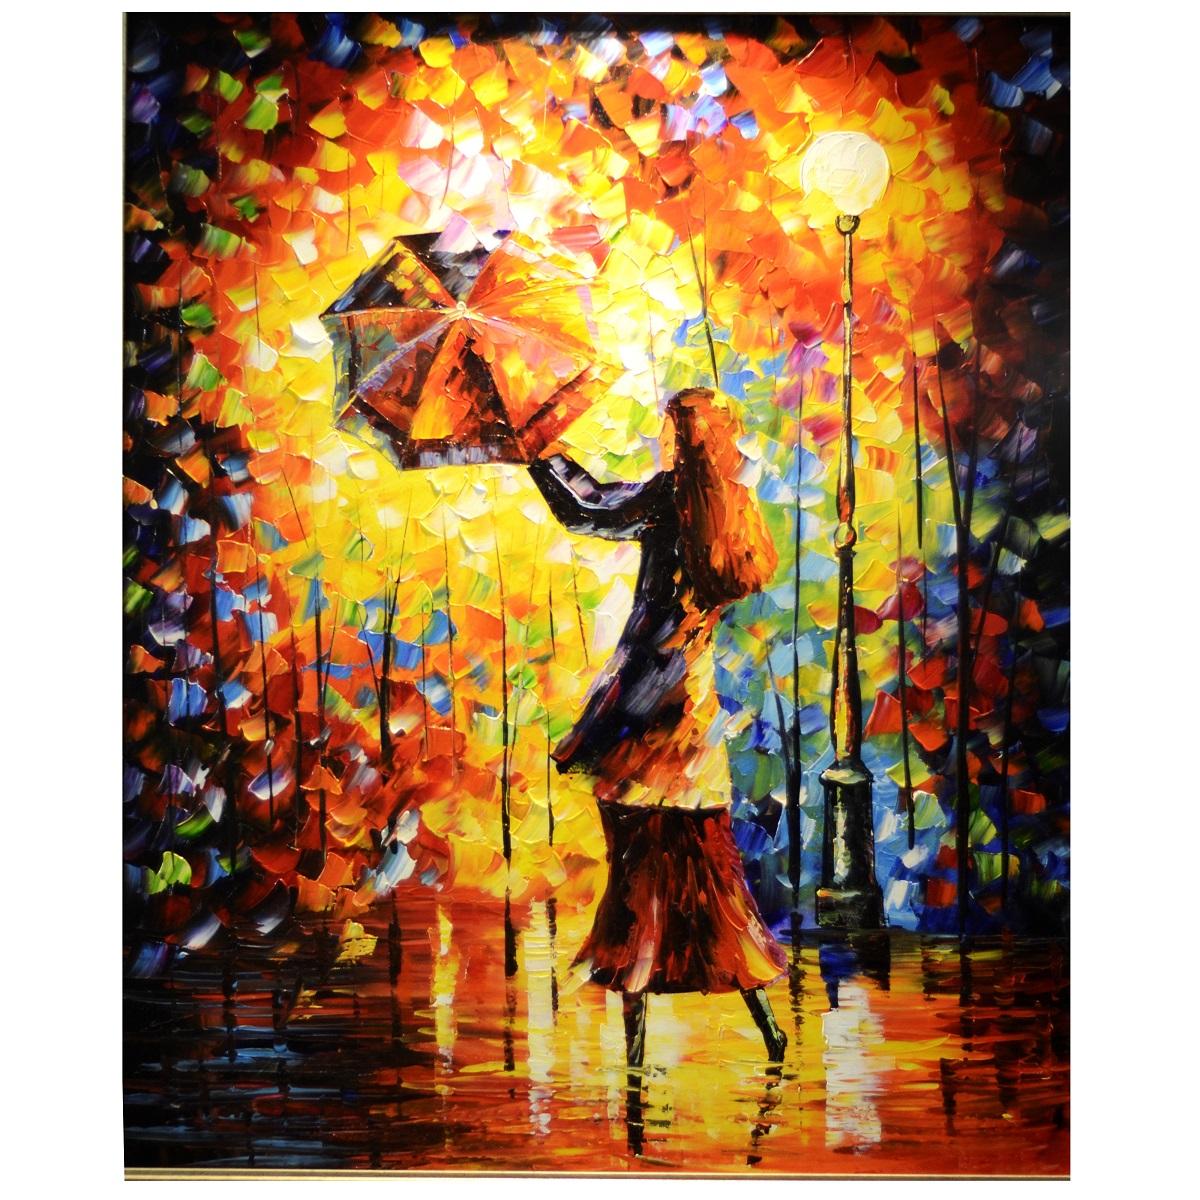 Liven Your Walls Paintings Tierra Este: Art Canvas Oil Paintings